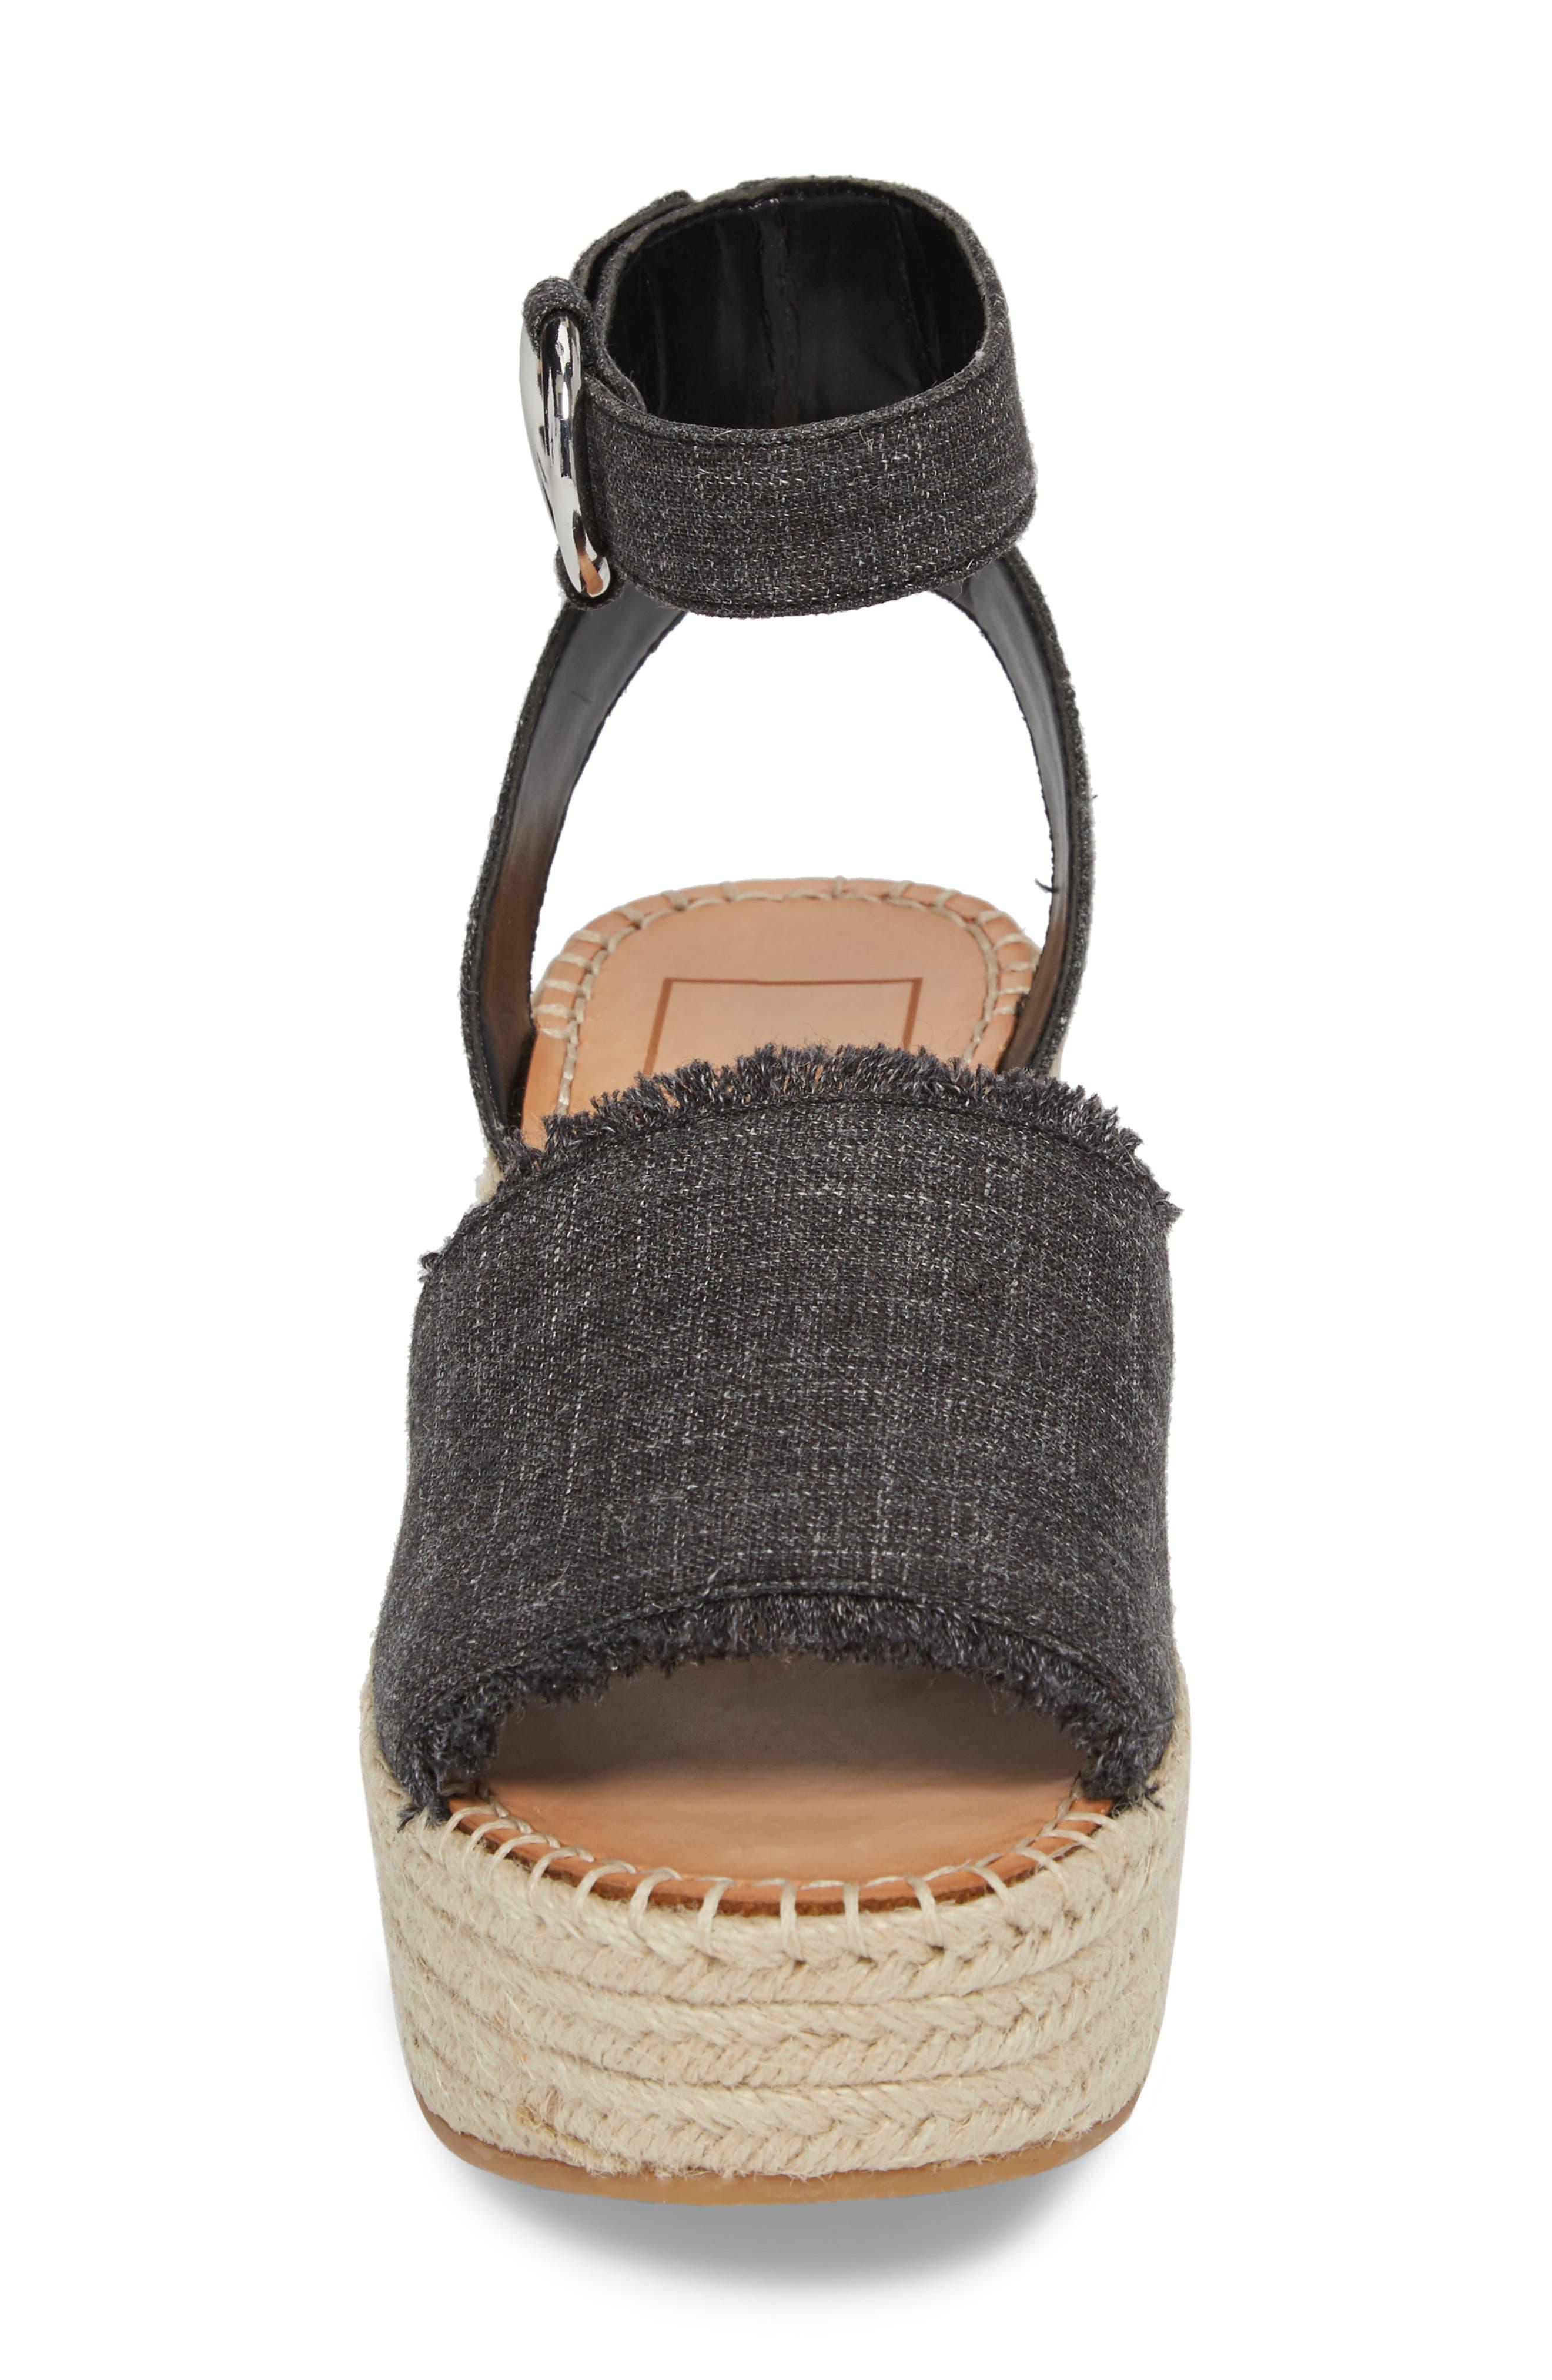 Lesly Espadrille Platform Sandal,                             Alternate thumbnail 23, color,